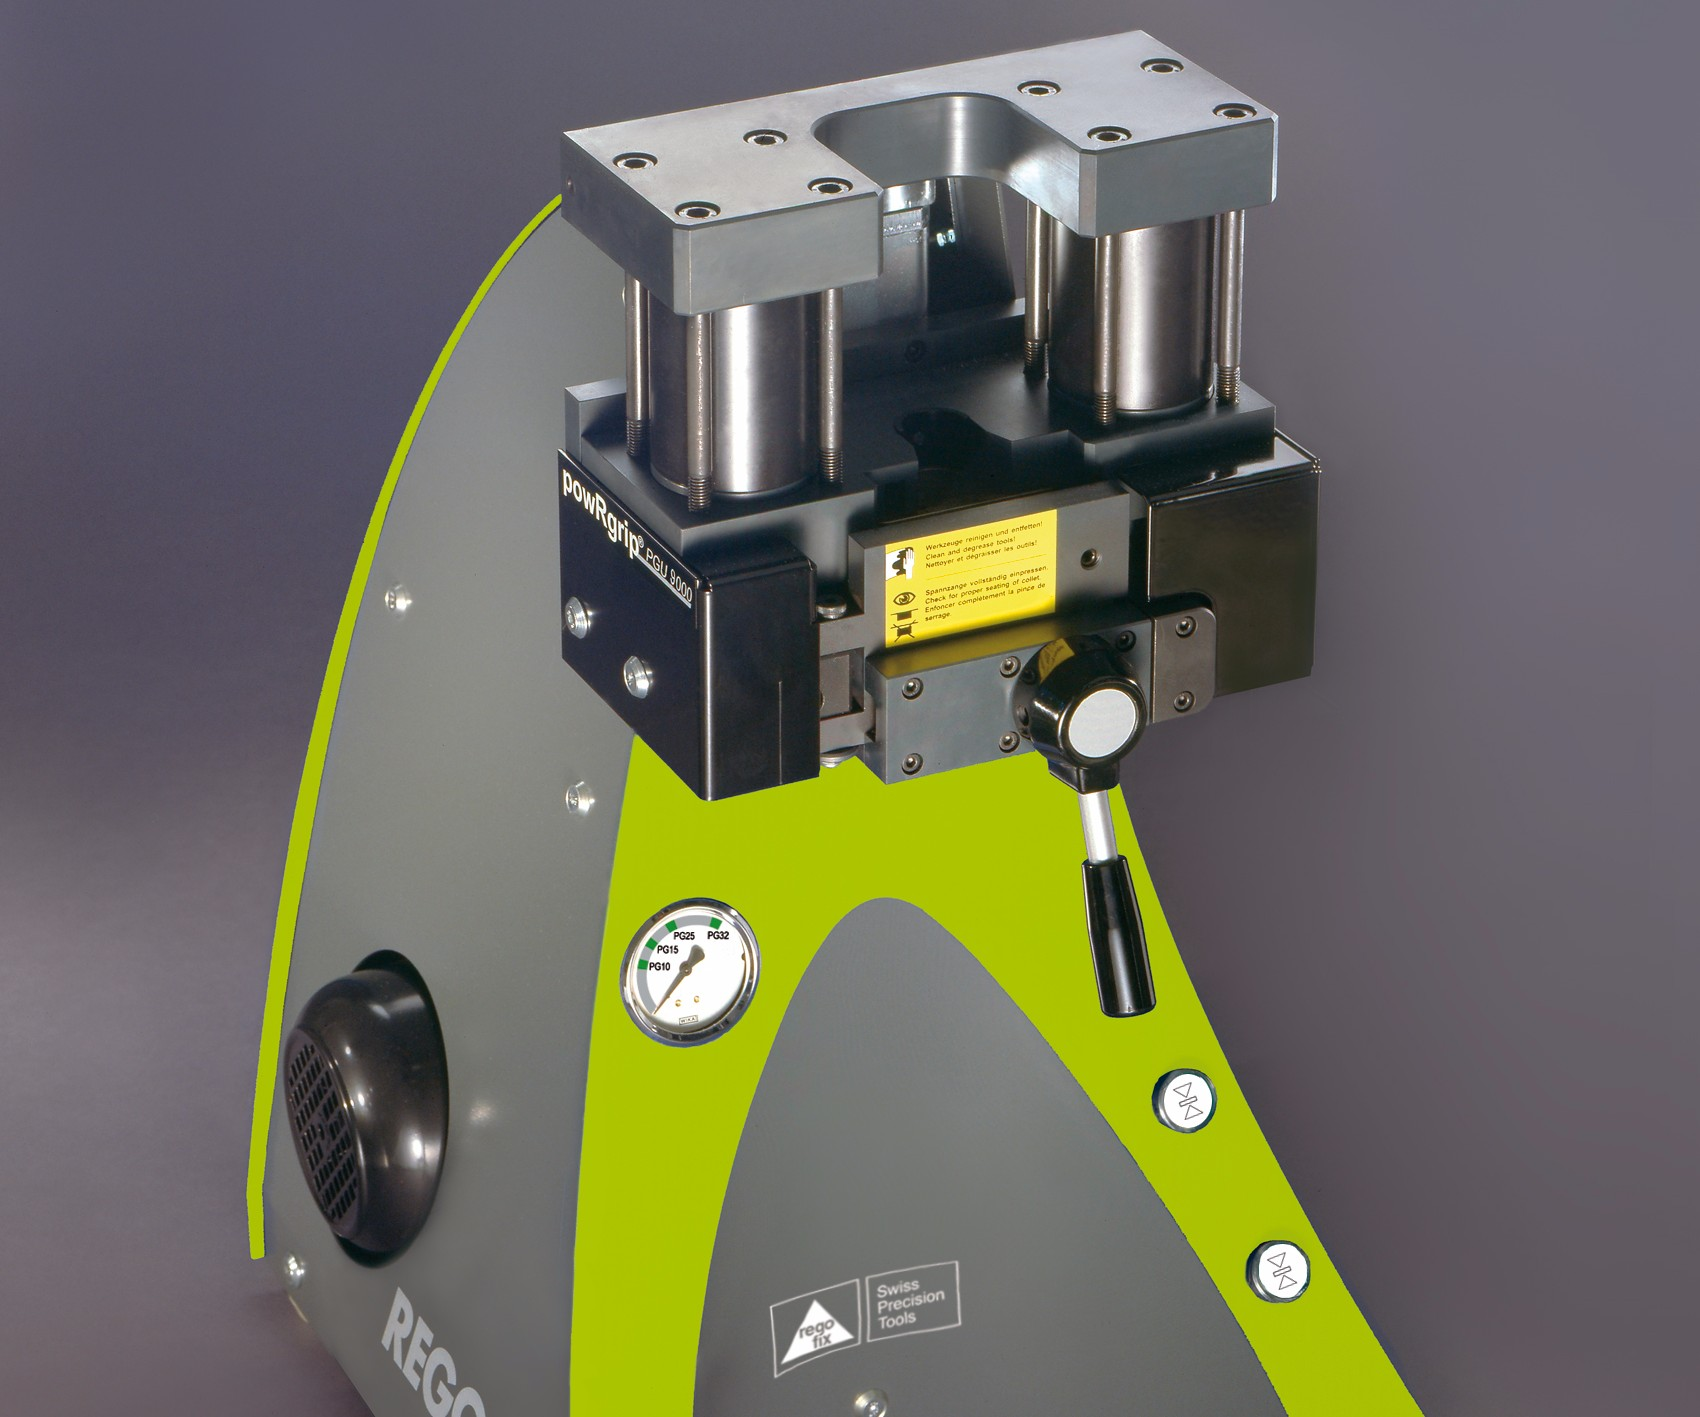 Rego-Fix PGU 9000